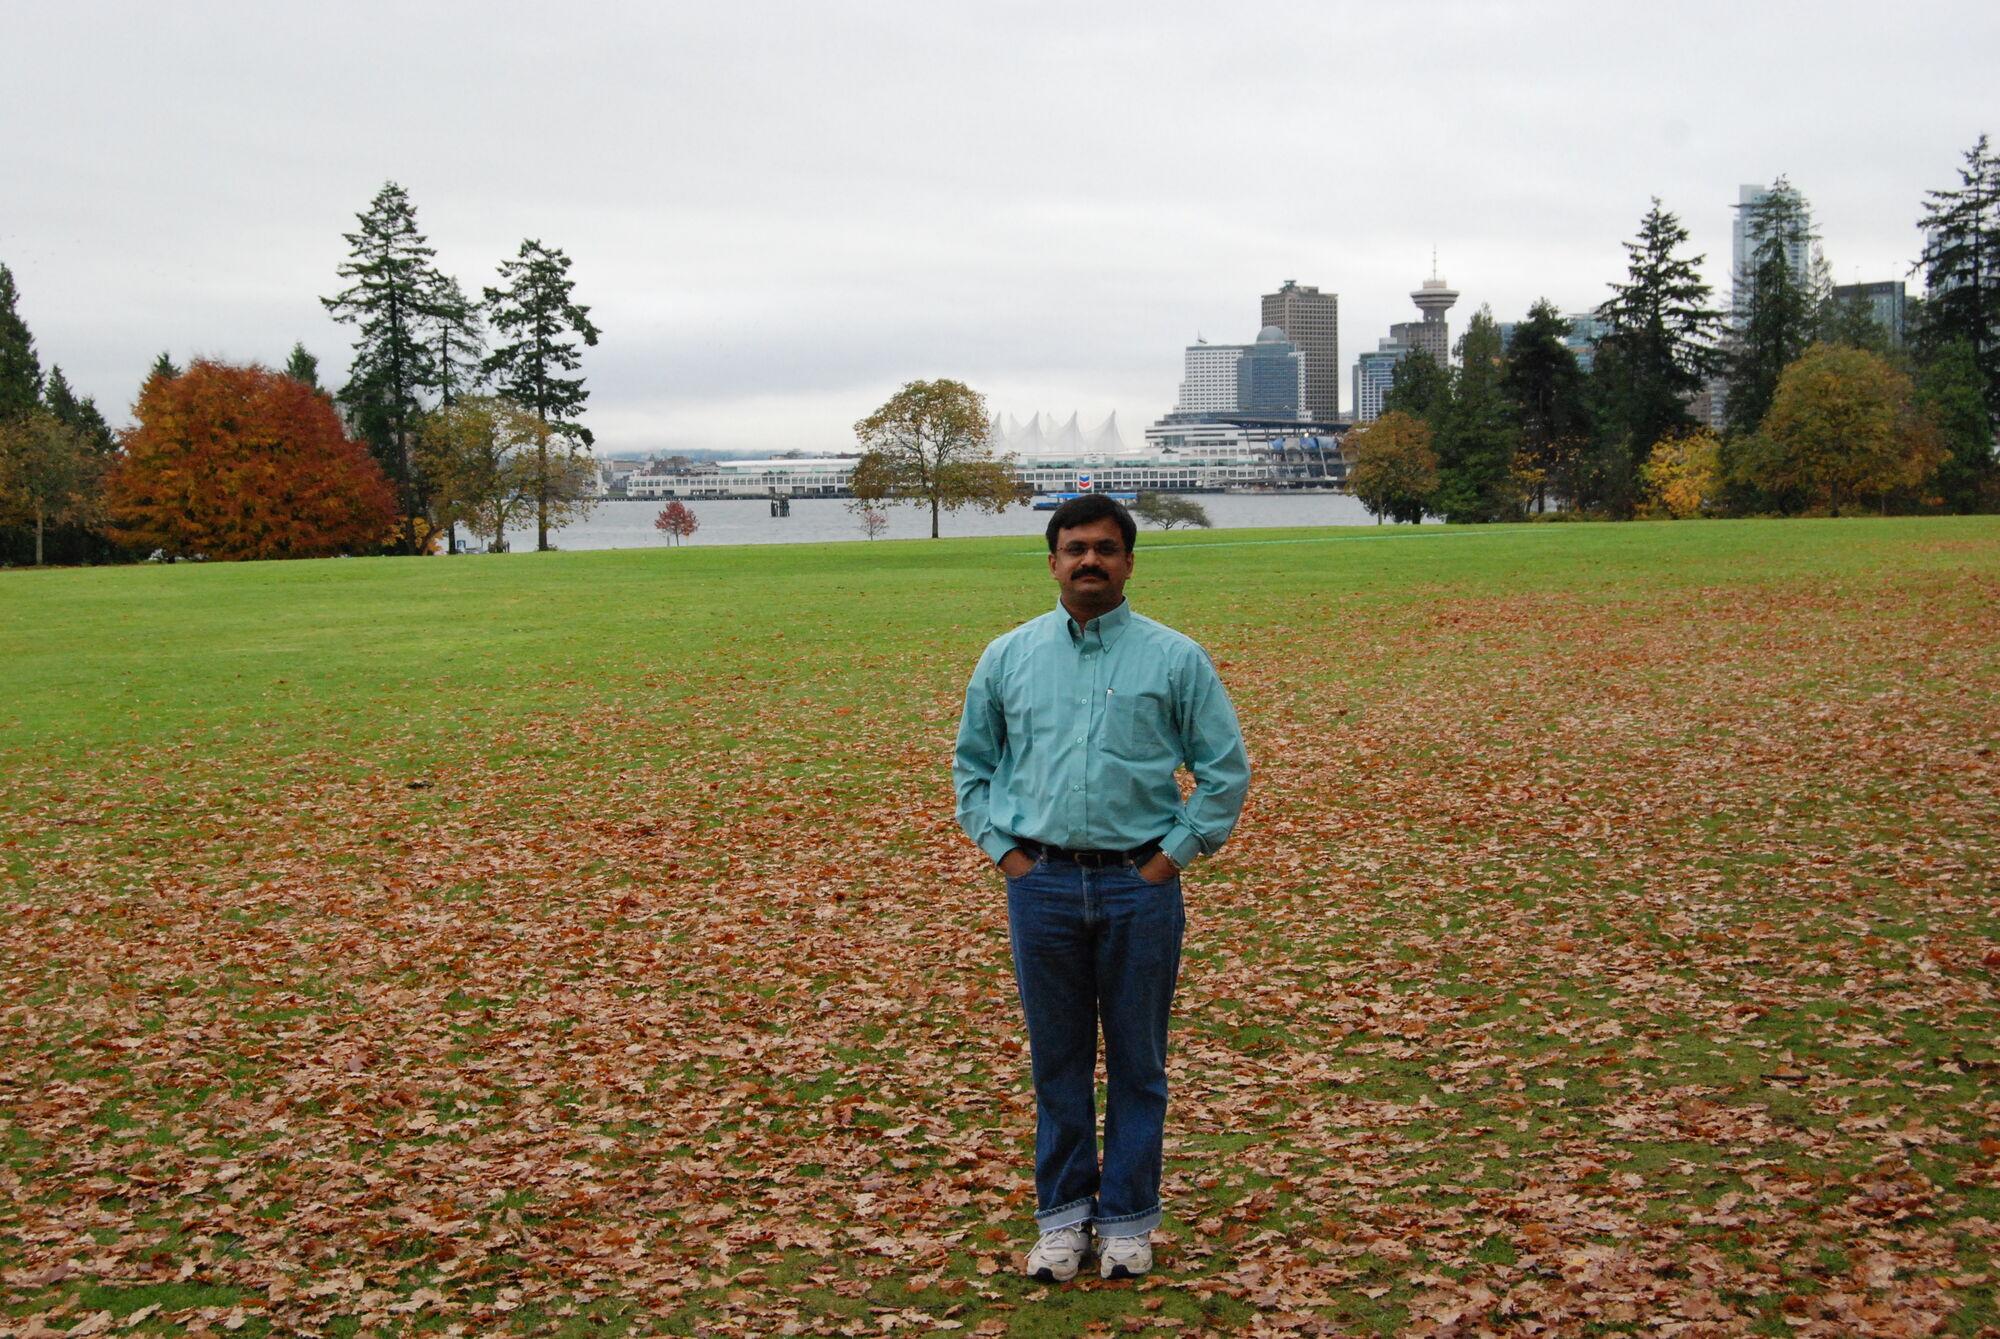 Stanley Park, Vancouver BC, Canada